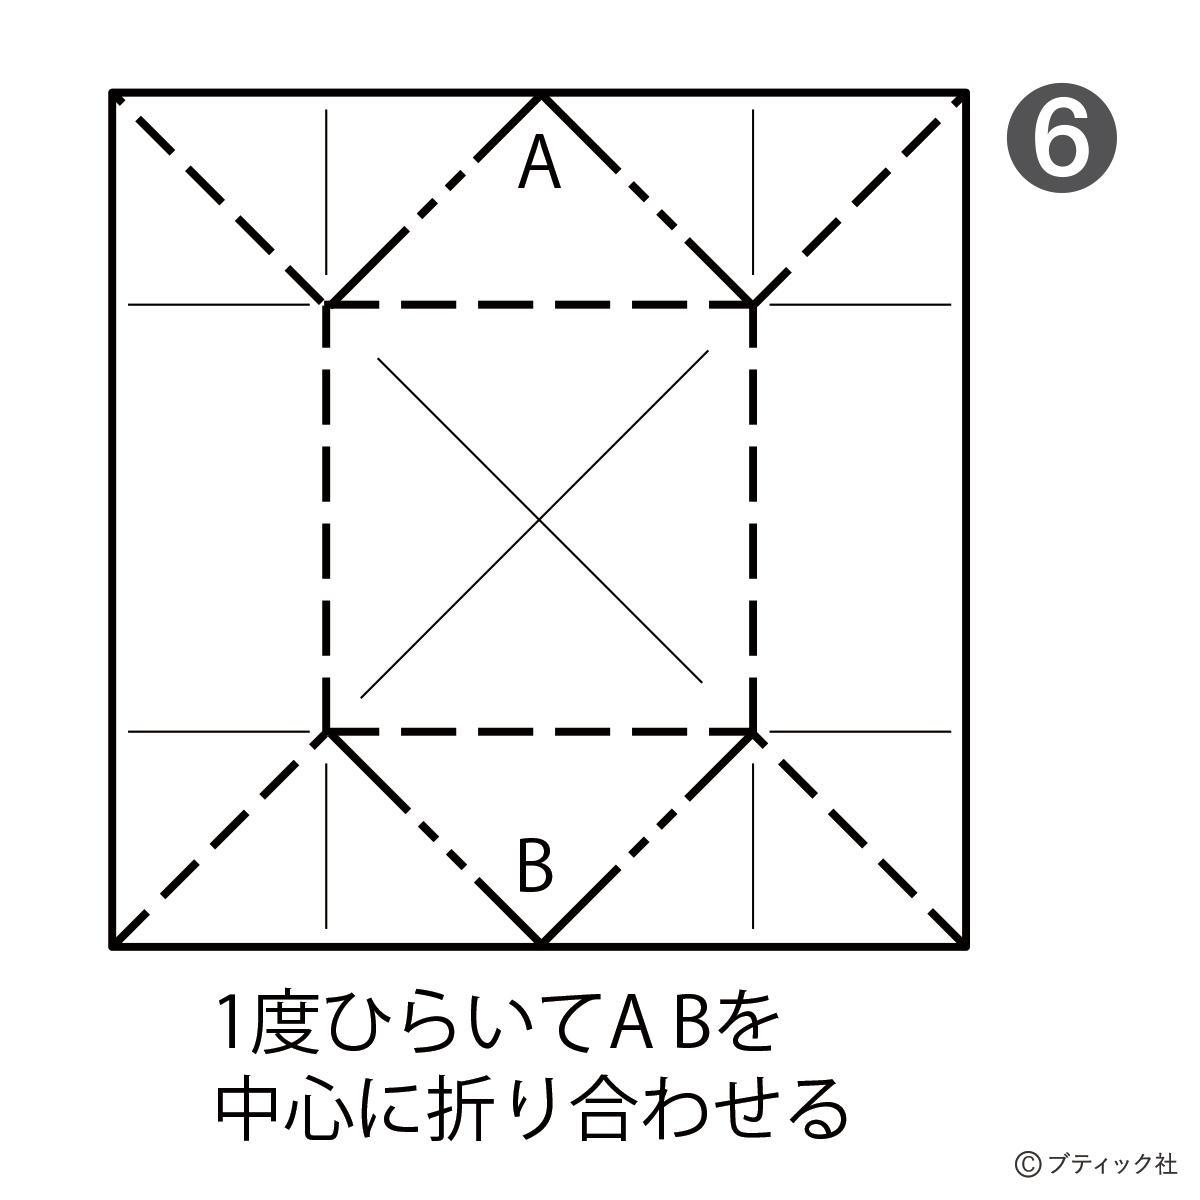 d4b4f8a87ff9ac7fbb37a5358af99e48